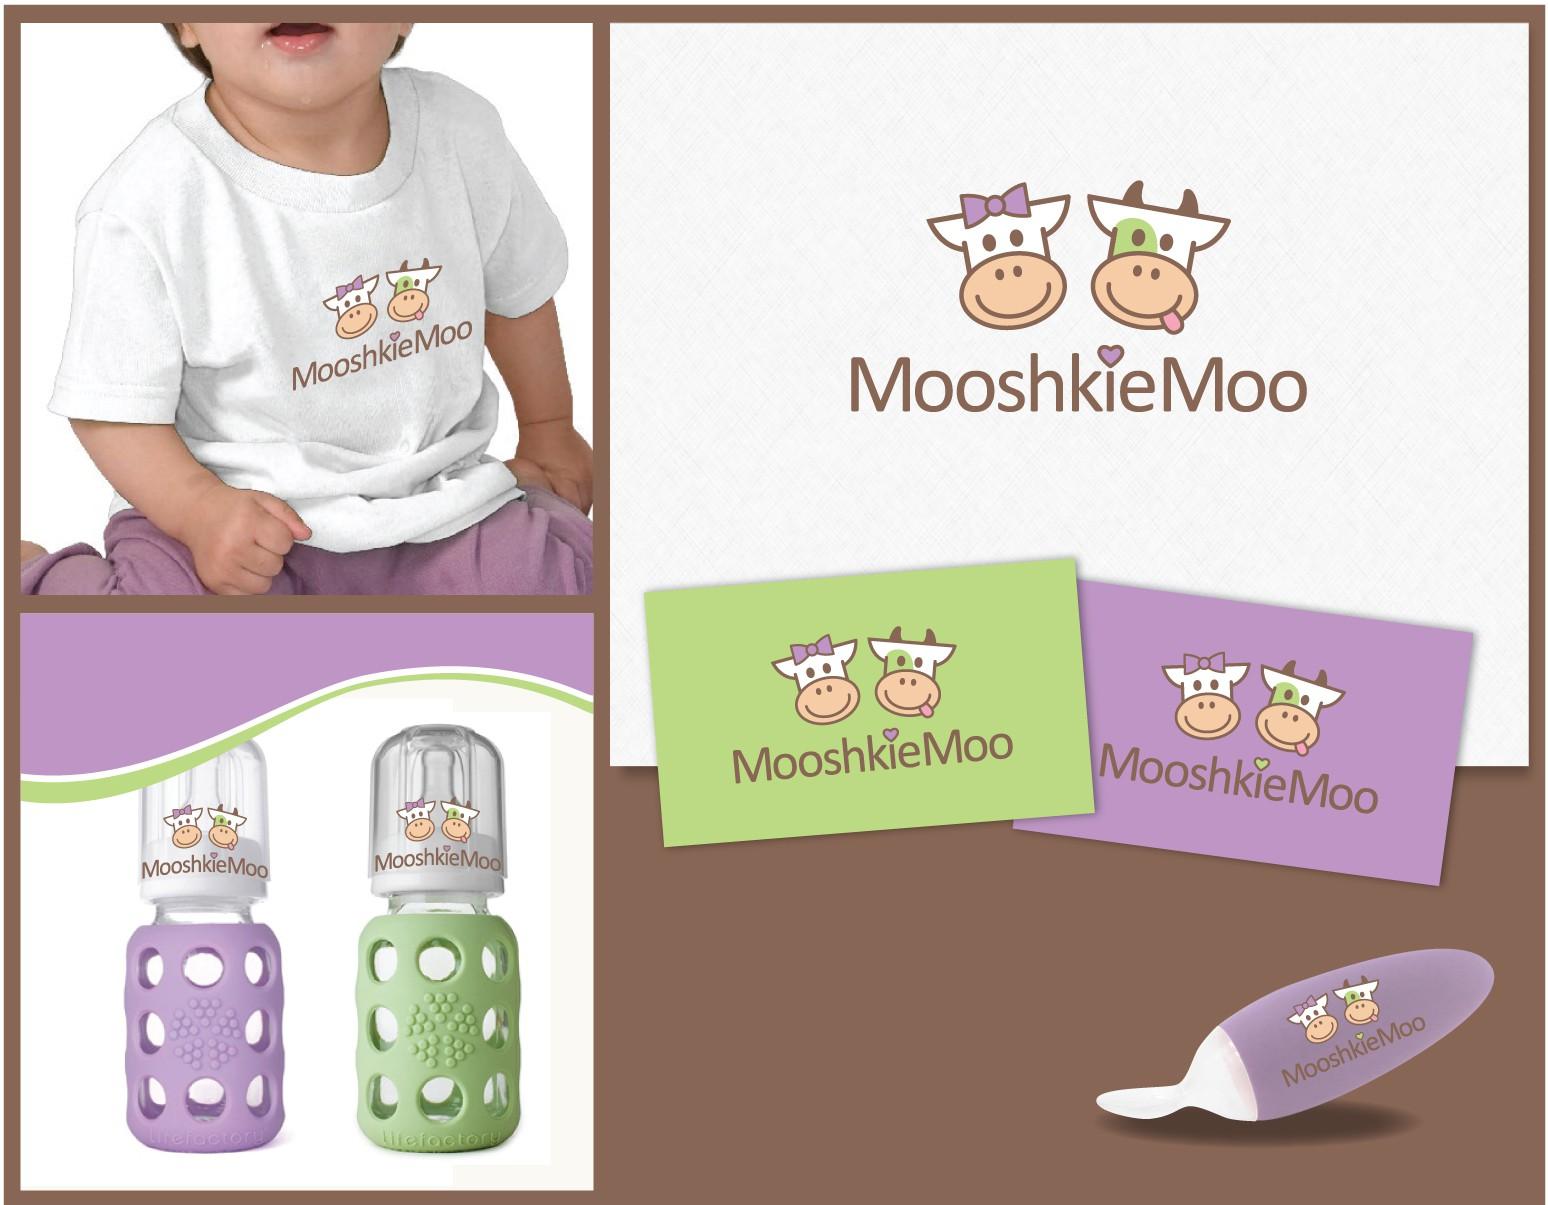 New logo wanted for Mooshkie Moo